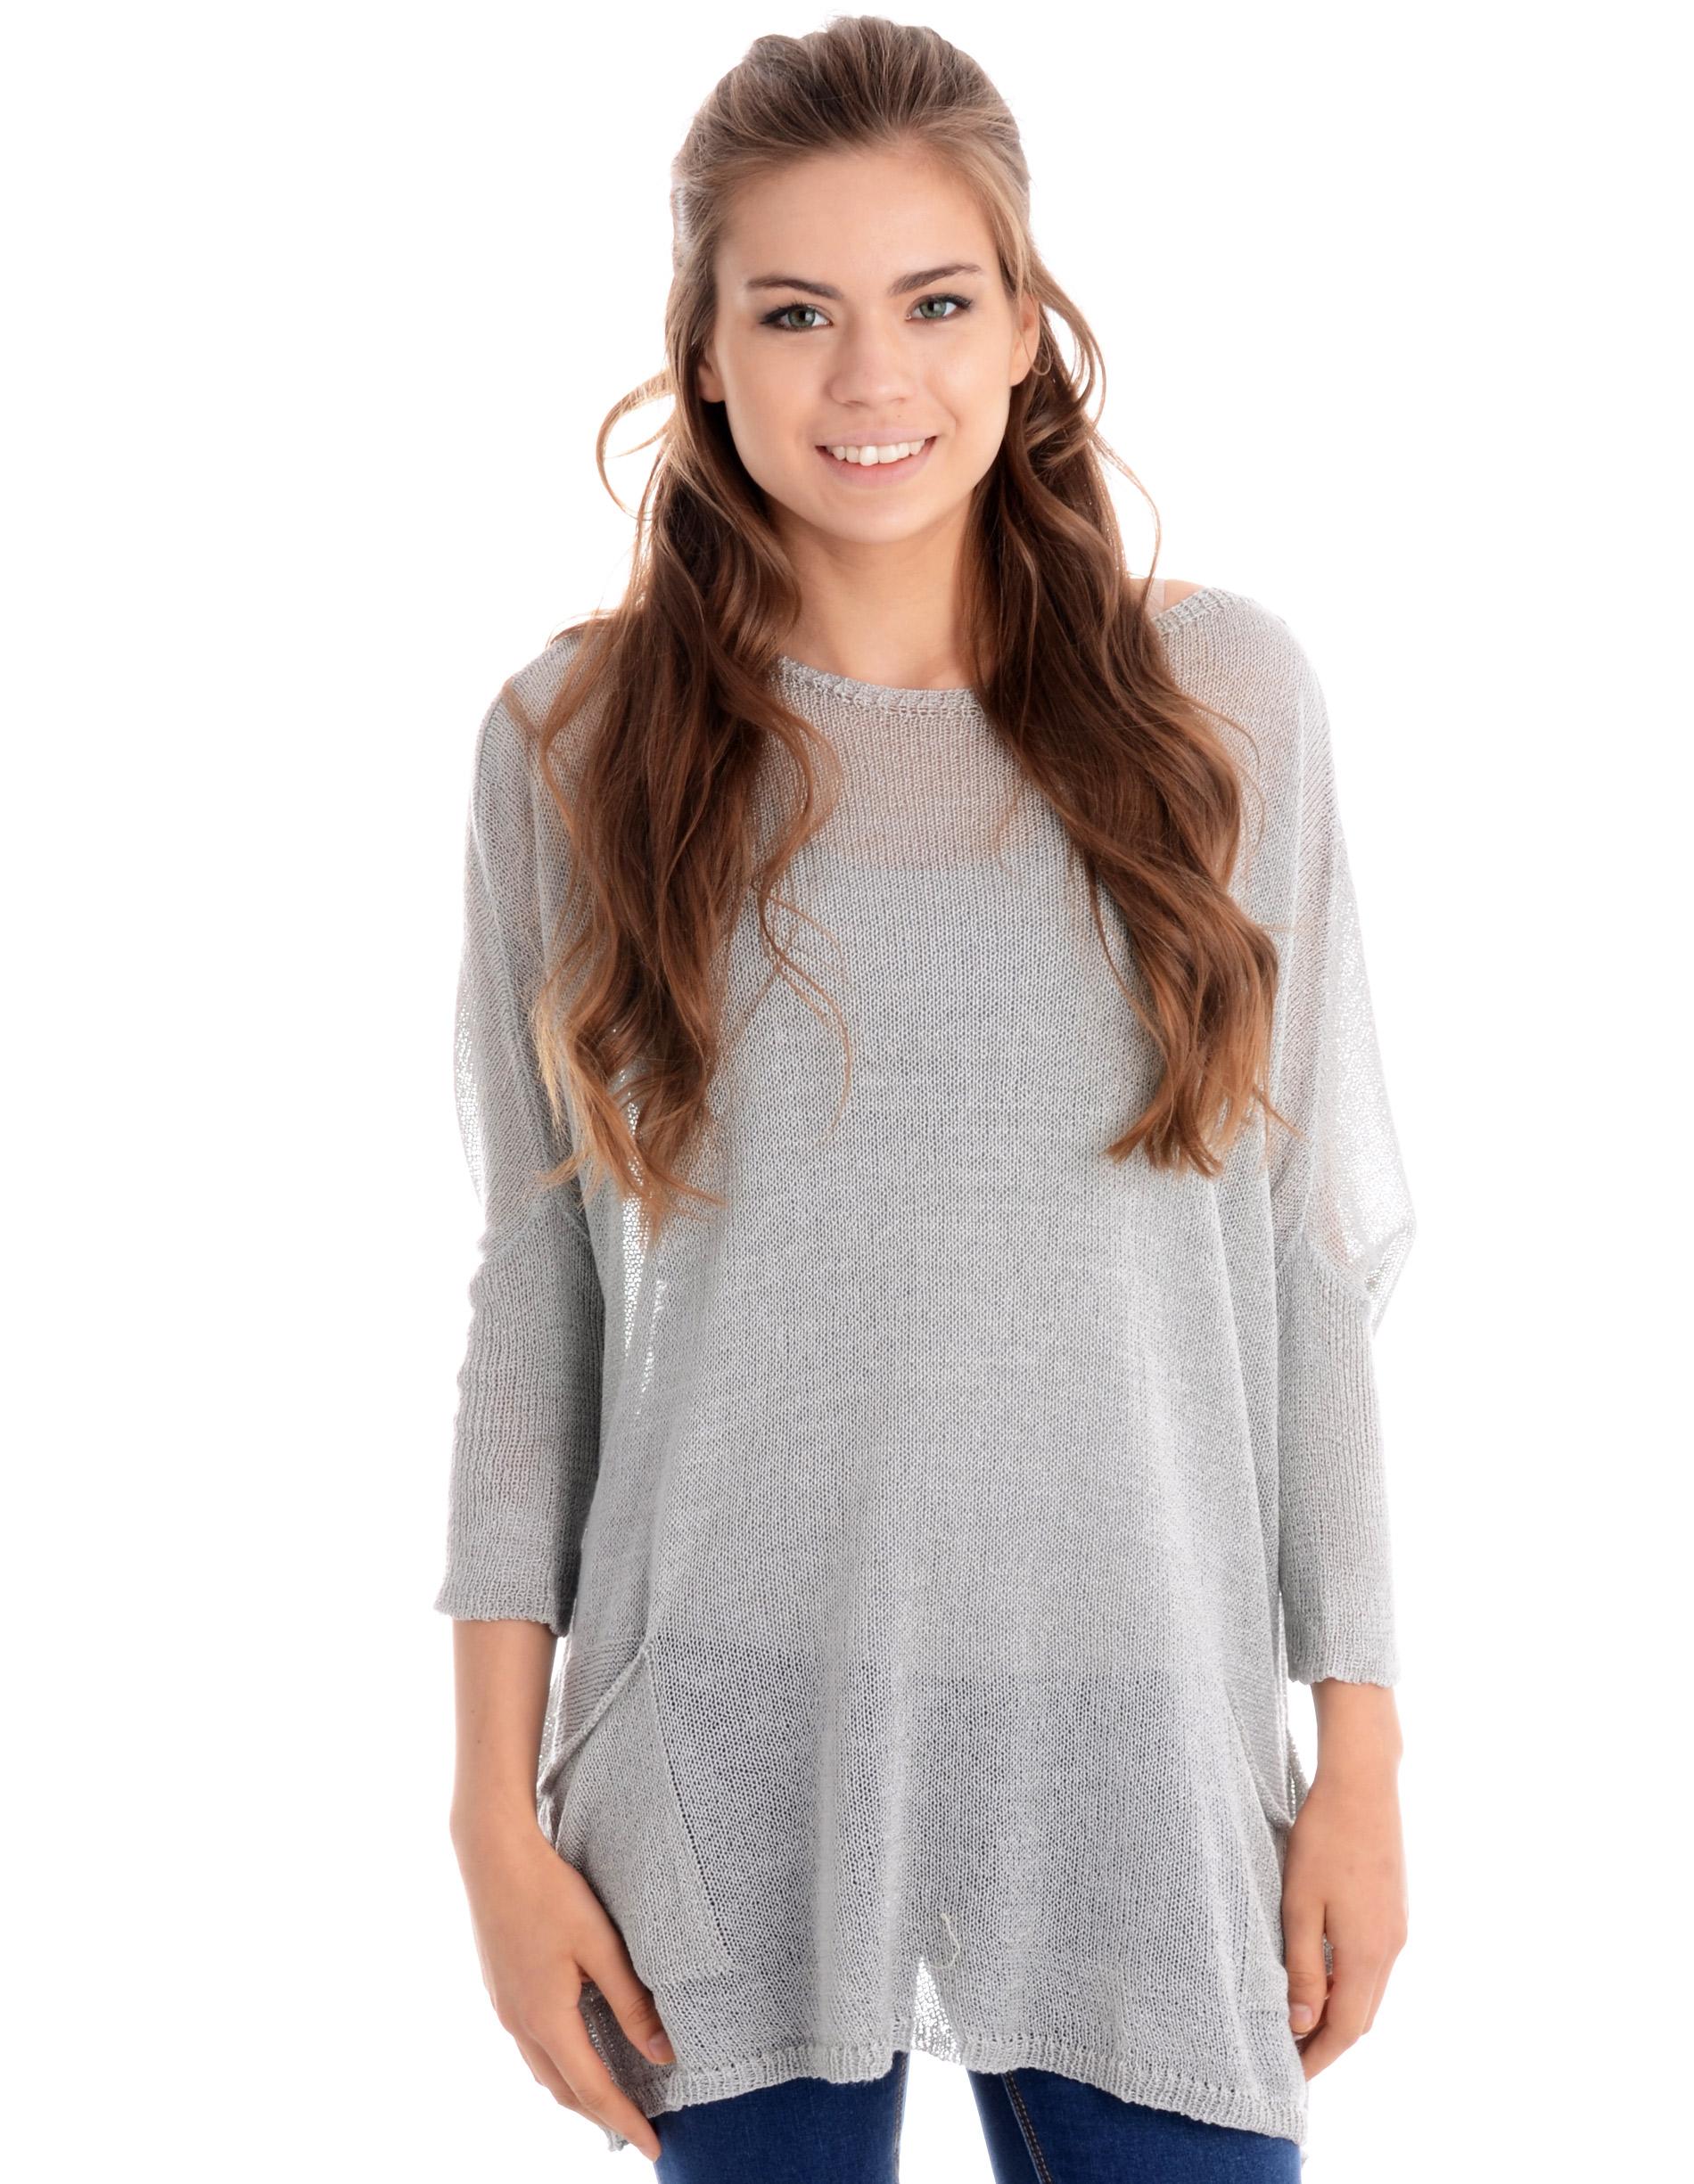 Sweter - 4-1019 PERLA - Unisono